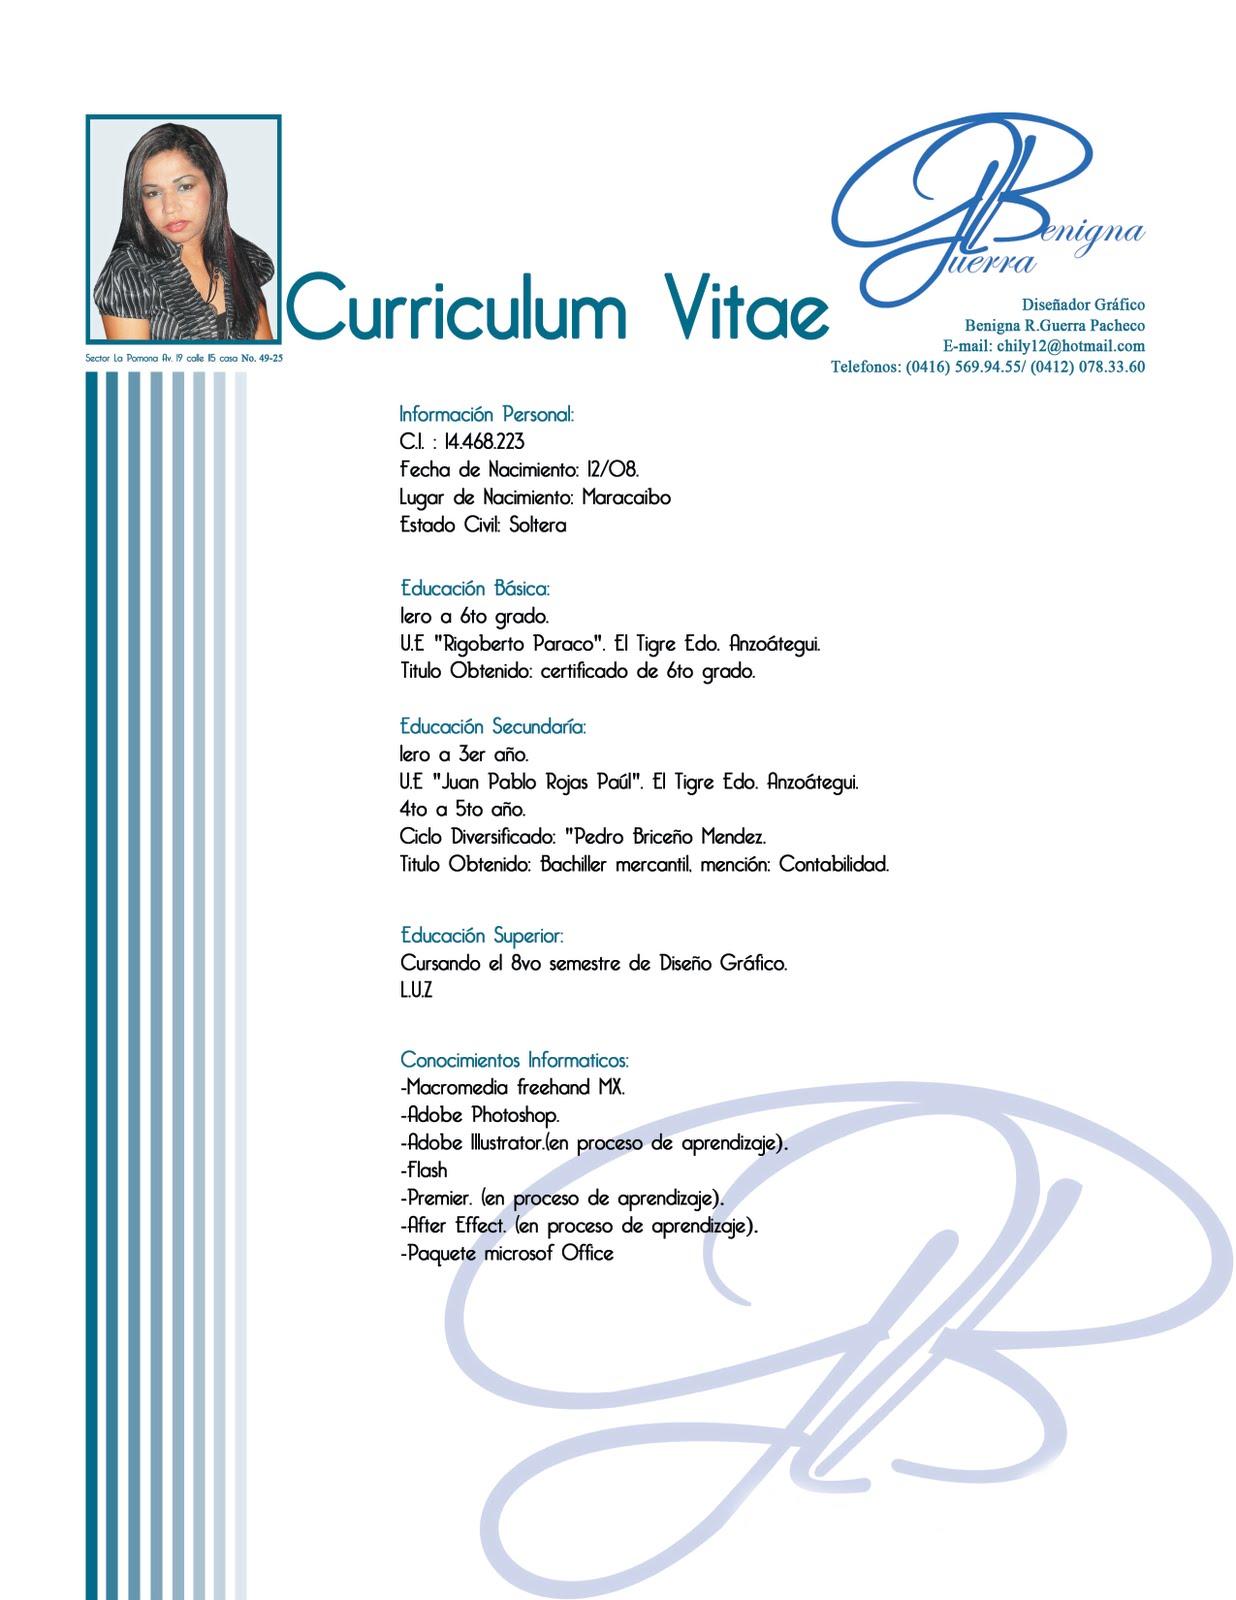 Modelo De Curriculum Vitae Venezuela 2016 - Modelo De Curriculum Vitae